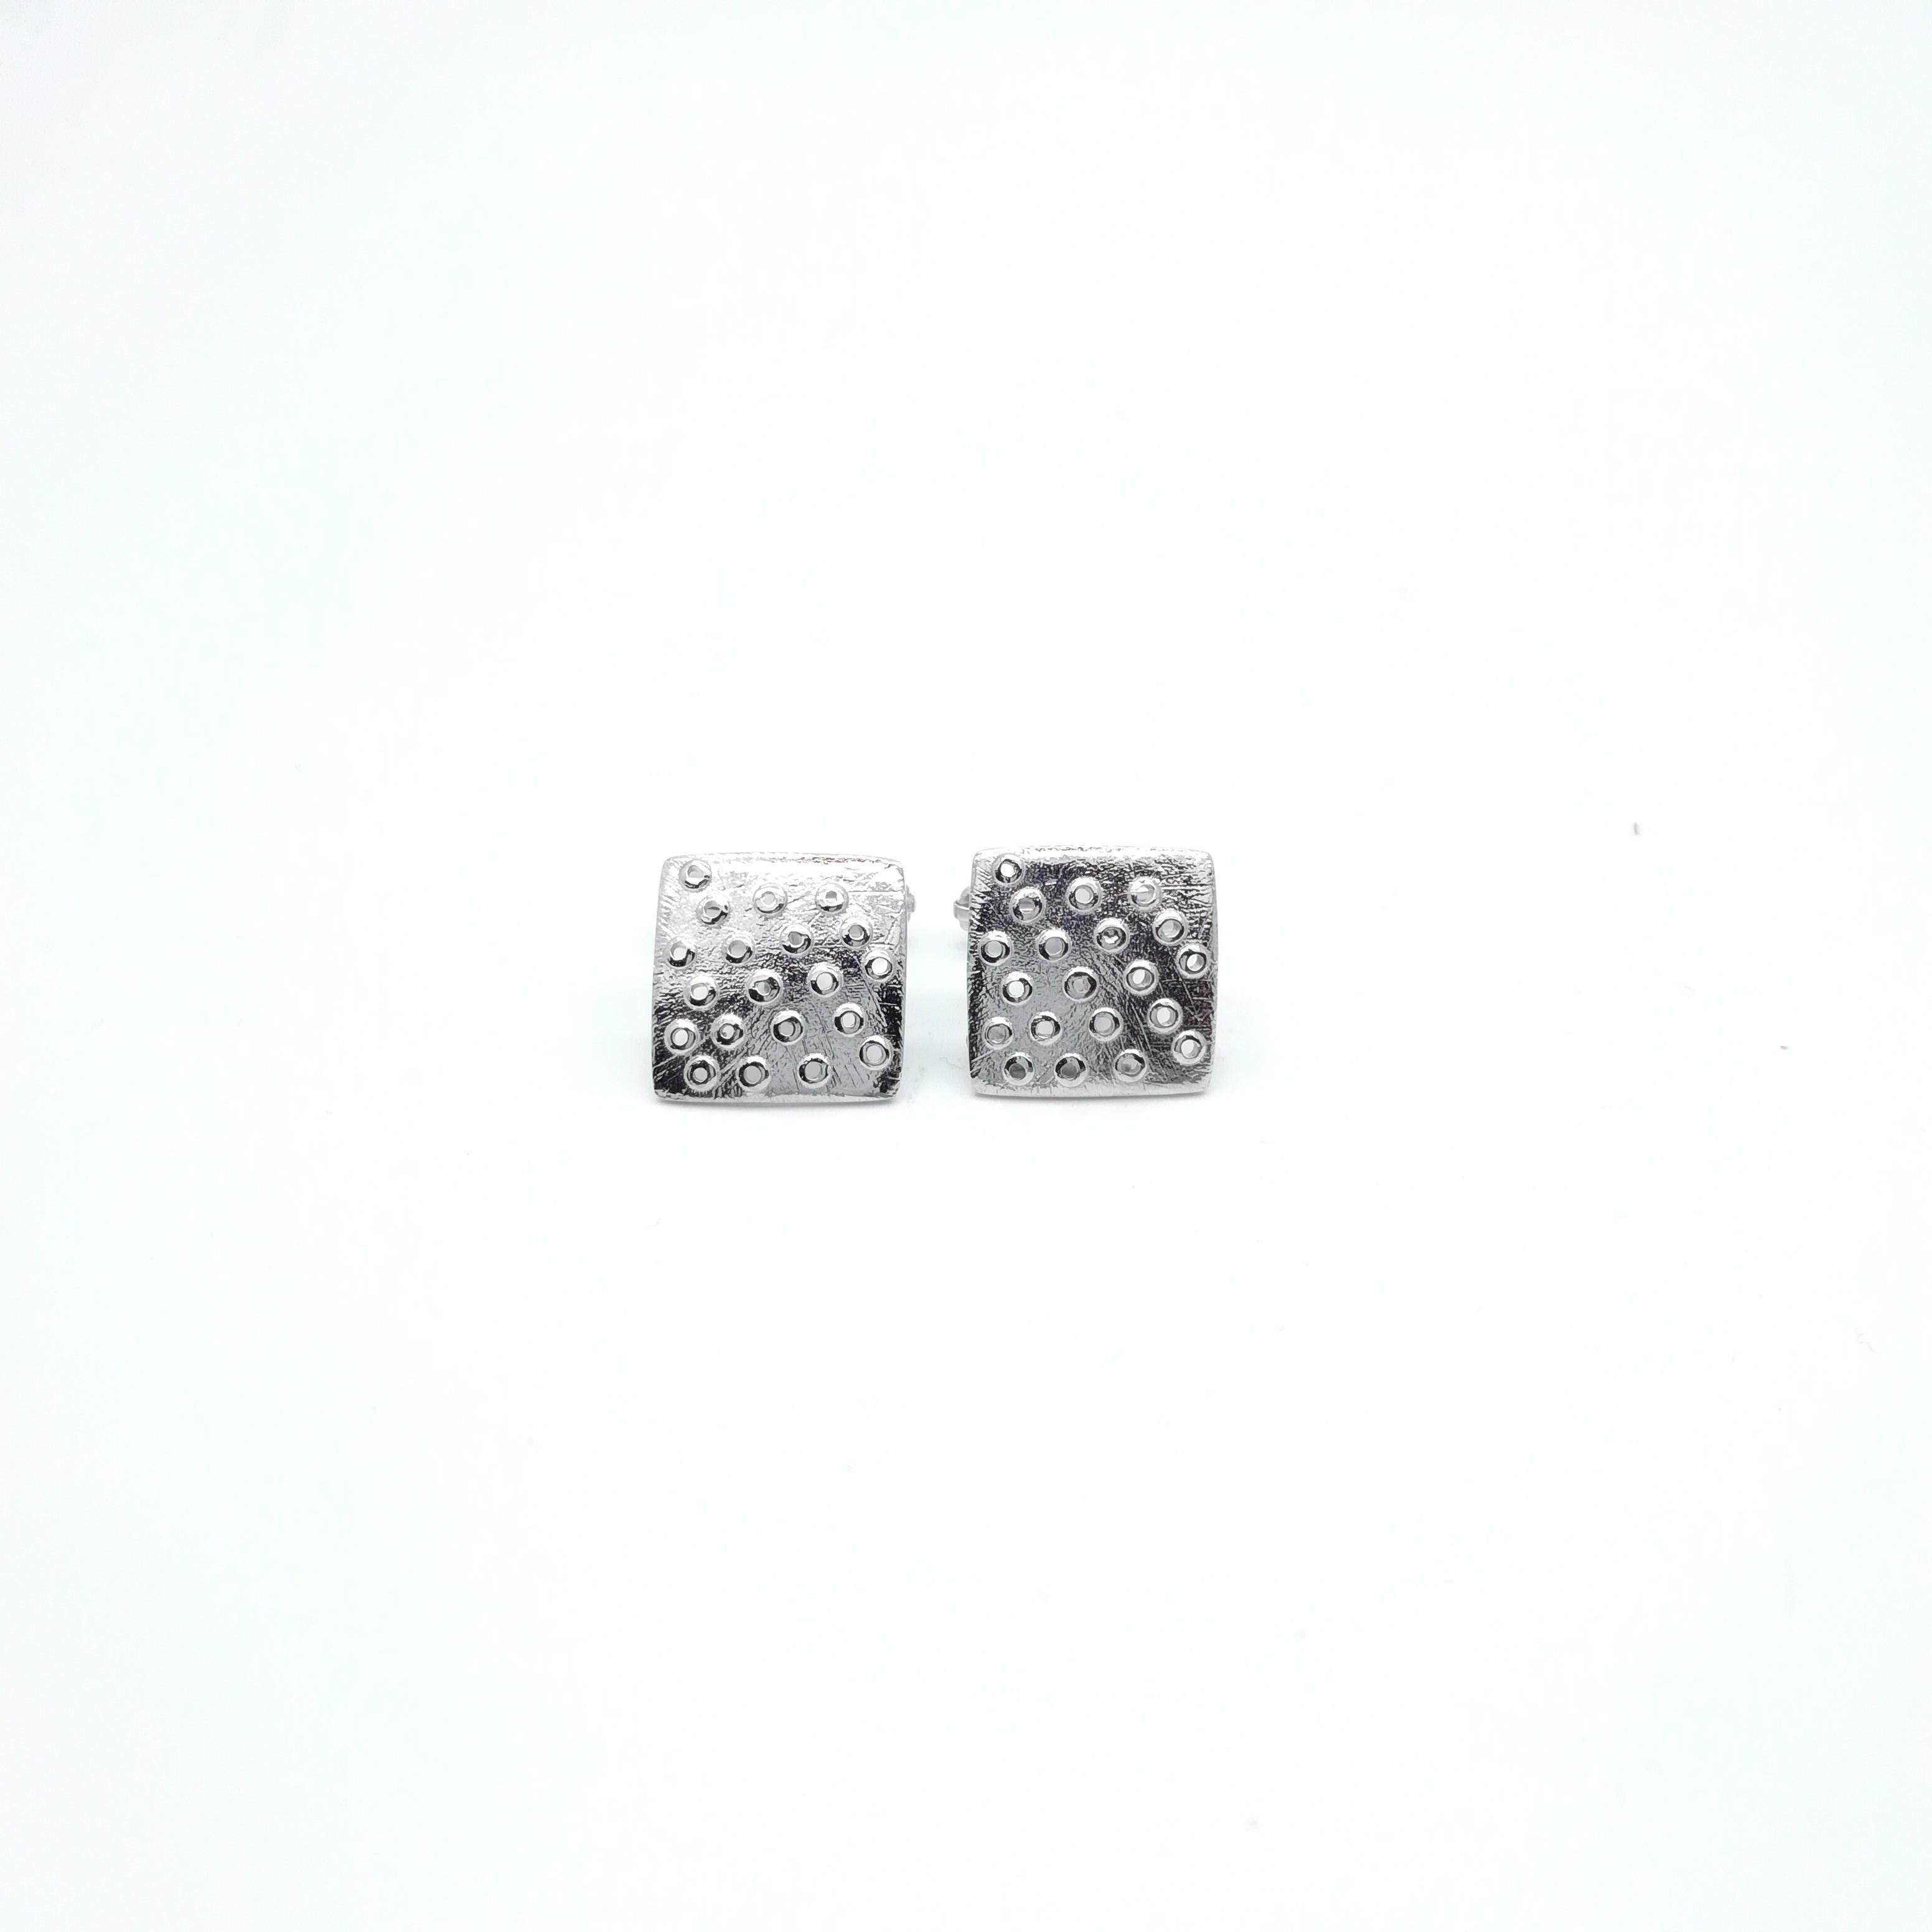 Silver cuff links 925 rhodium plated